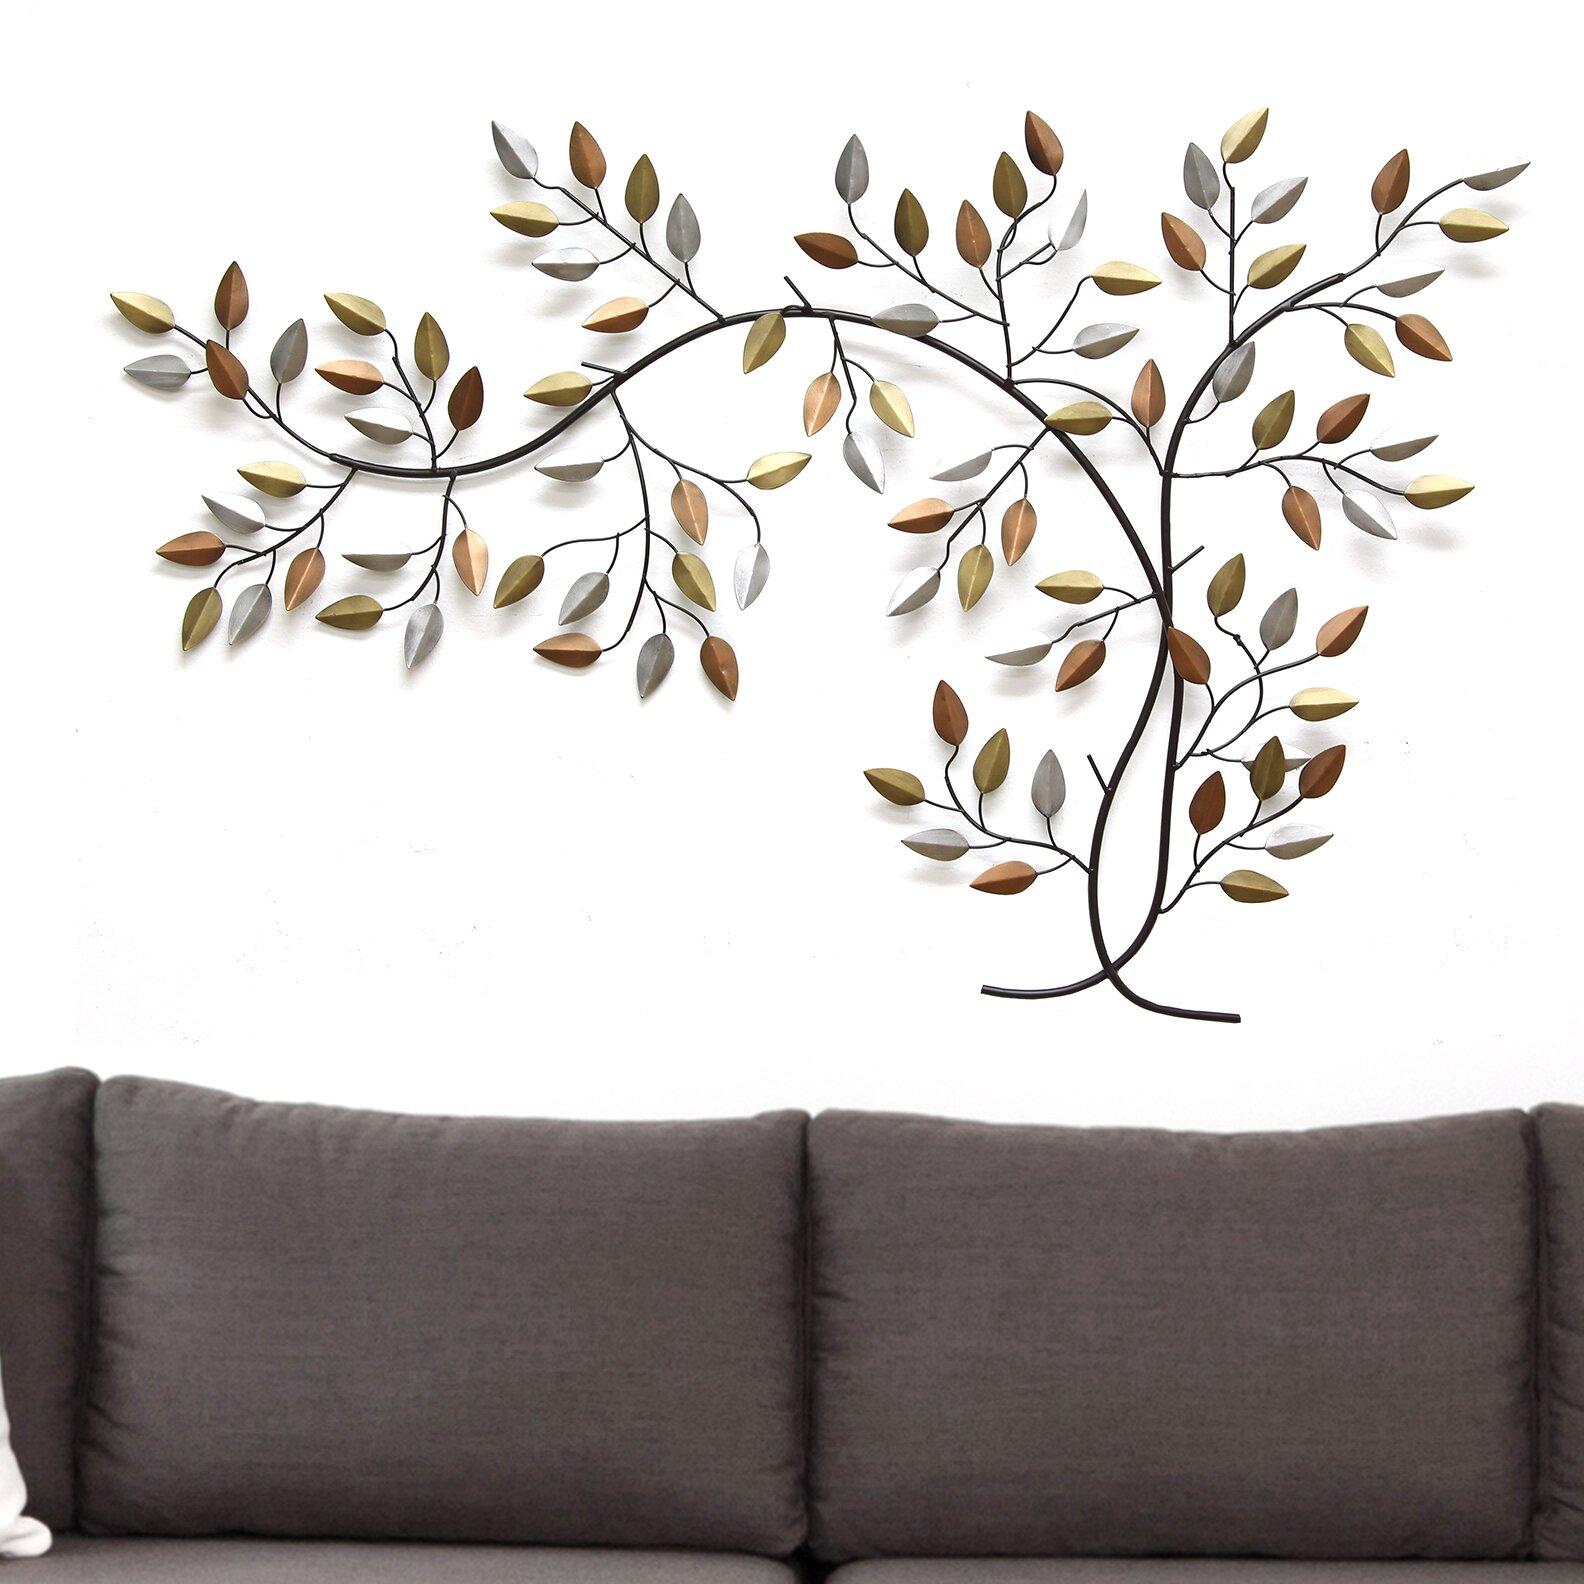 Stratton Home Decor Tree Branch Wall Décor & Reviews